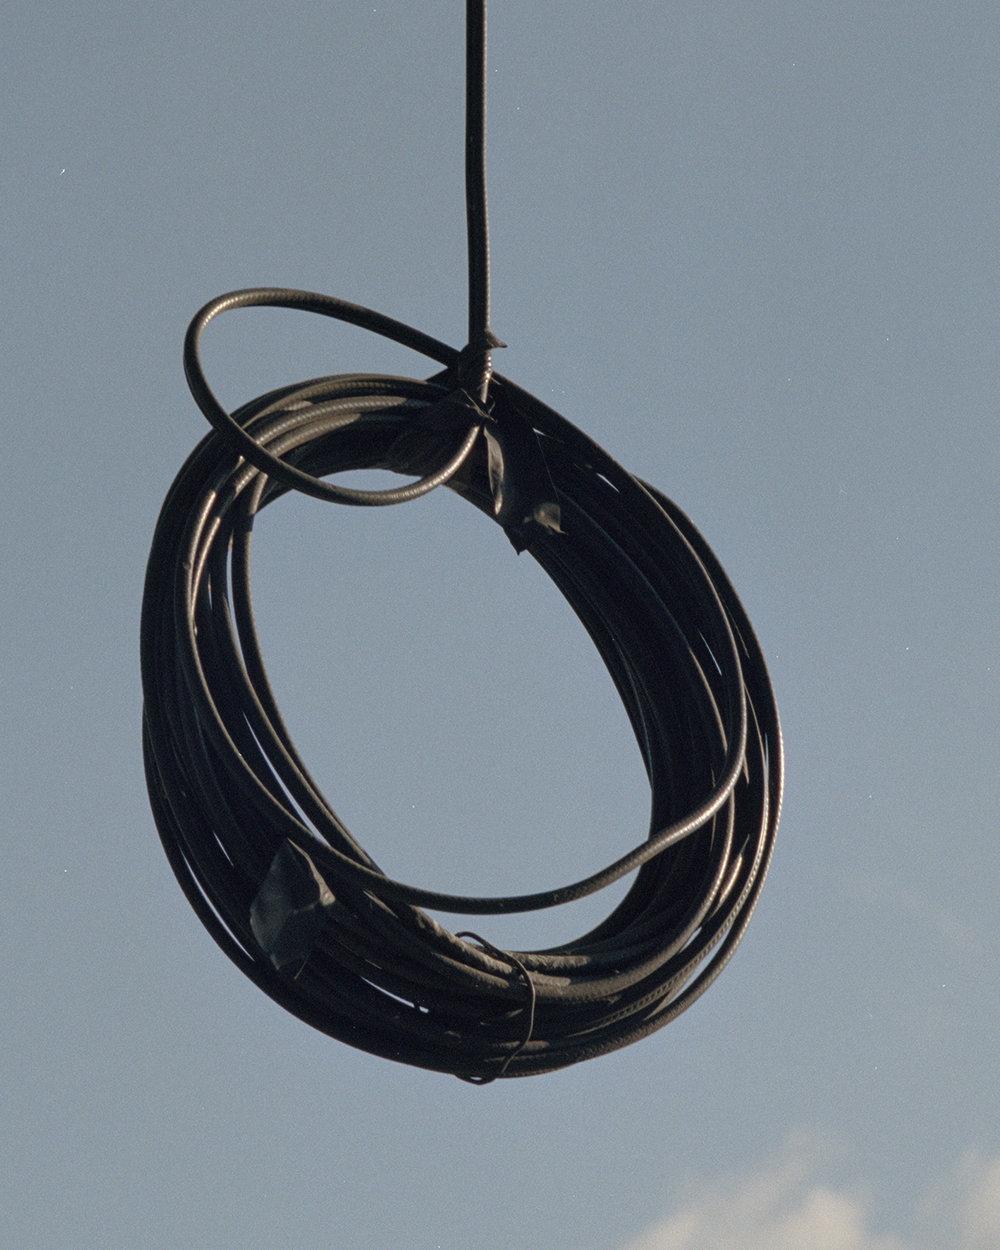 wire_noose 001